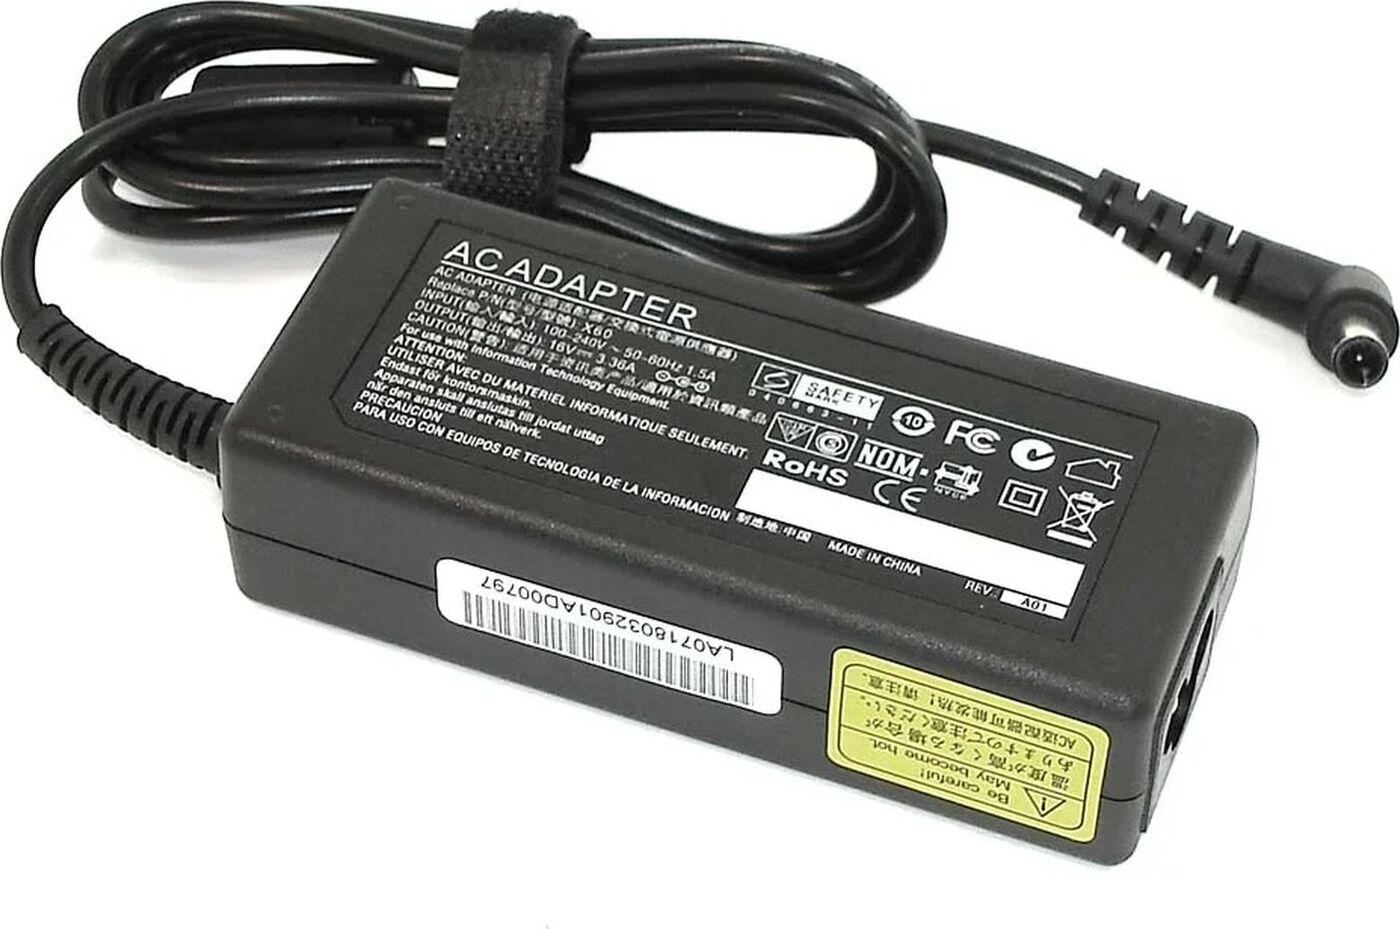 Блок питания Pitatel AD-246 для Fujitsu (16V 3.36A) адаптер питания для ноутбука pitatel ad 002